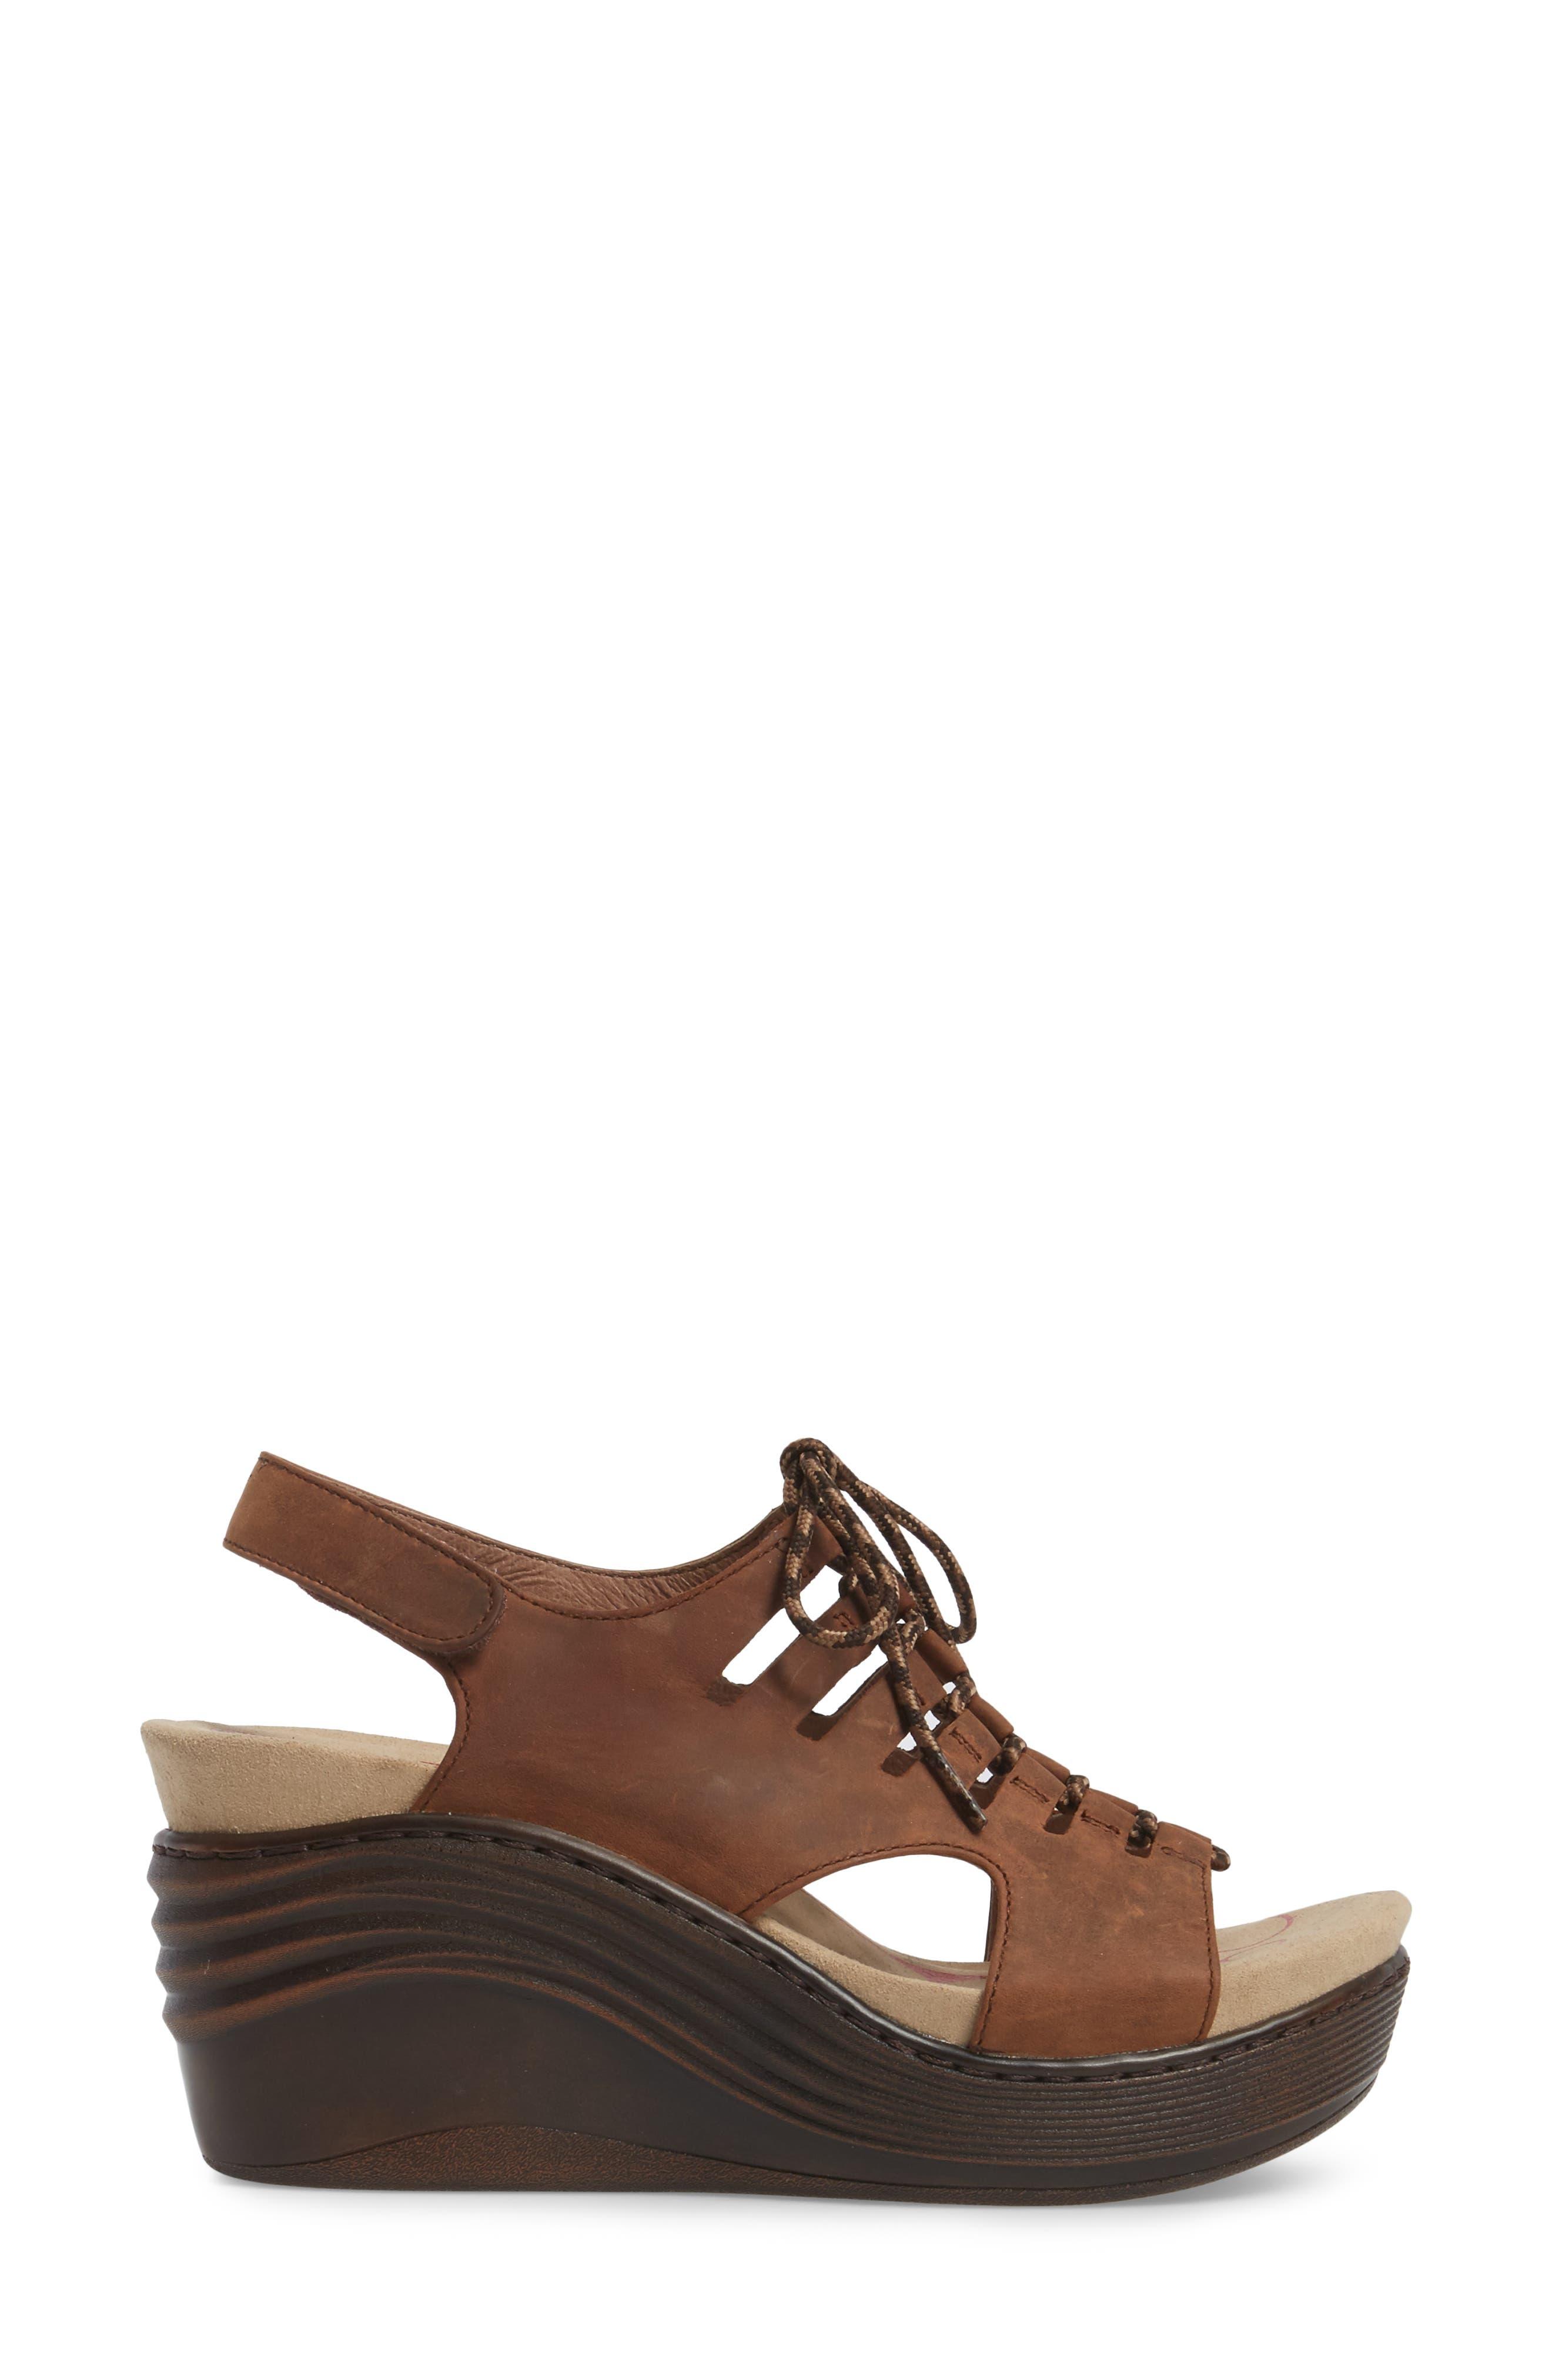 Alternate Image 3  - BIONICA Sirus Wedge Sandal (Women)